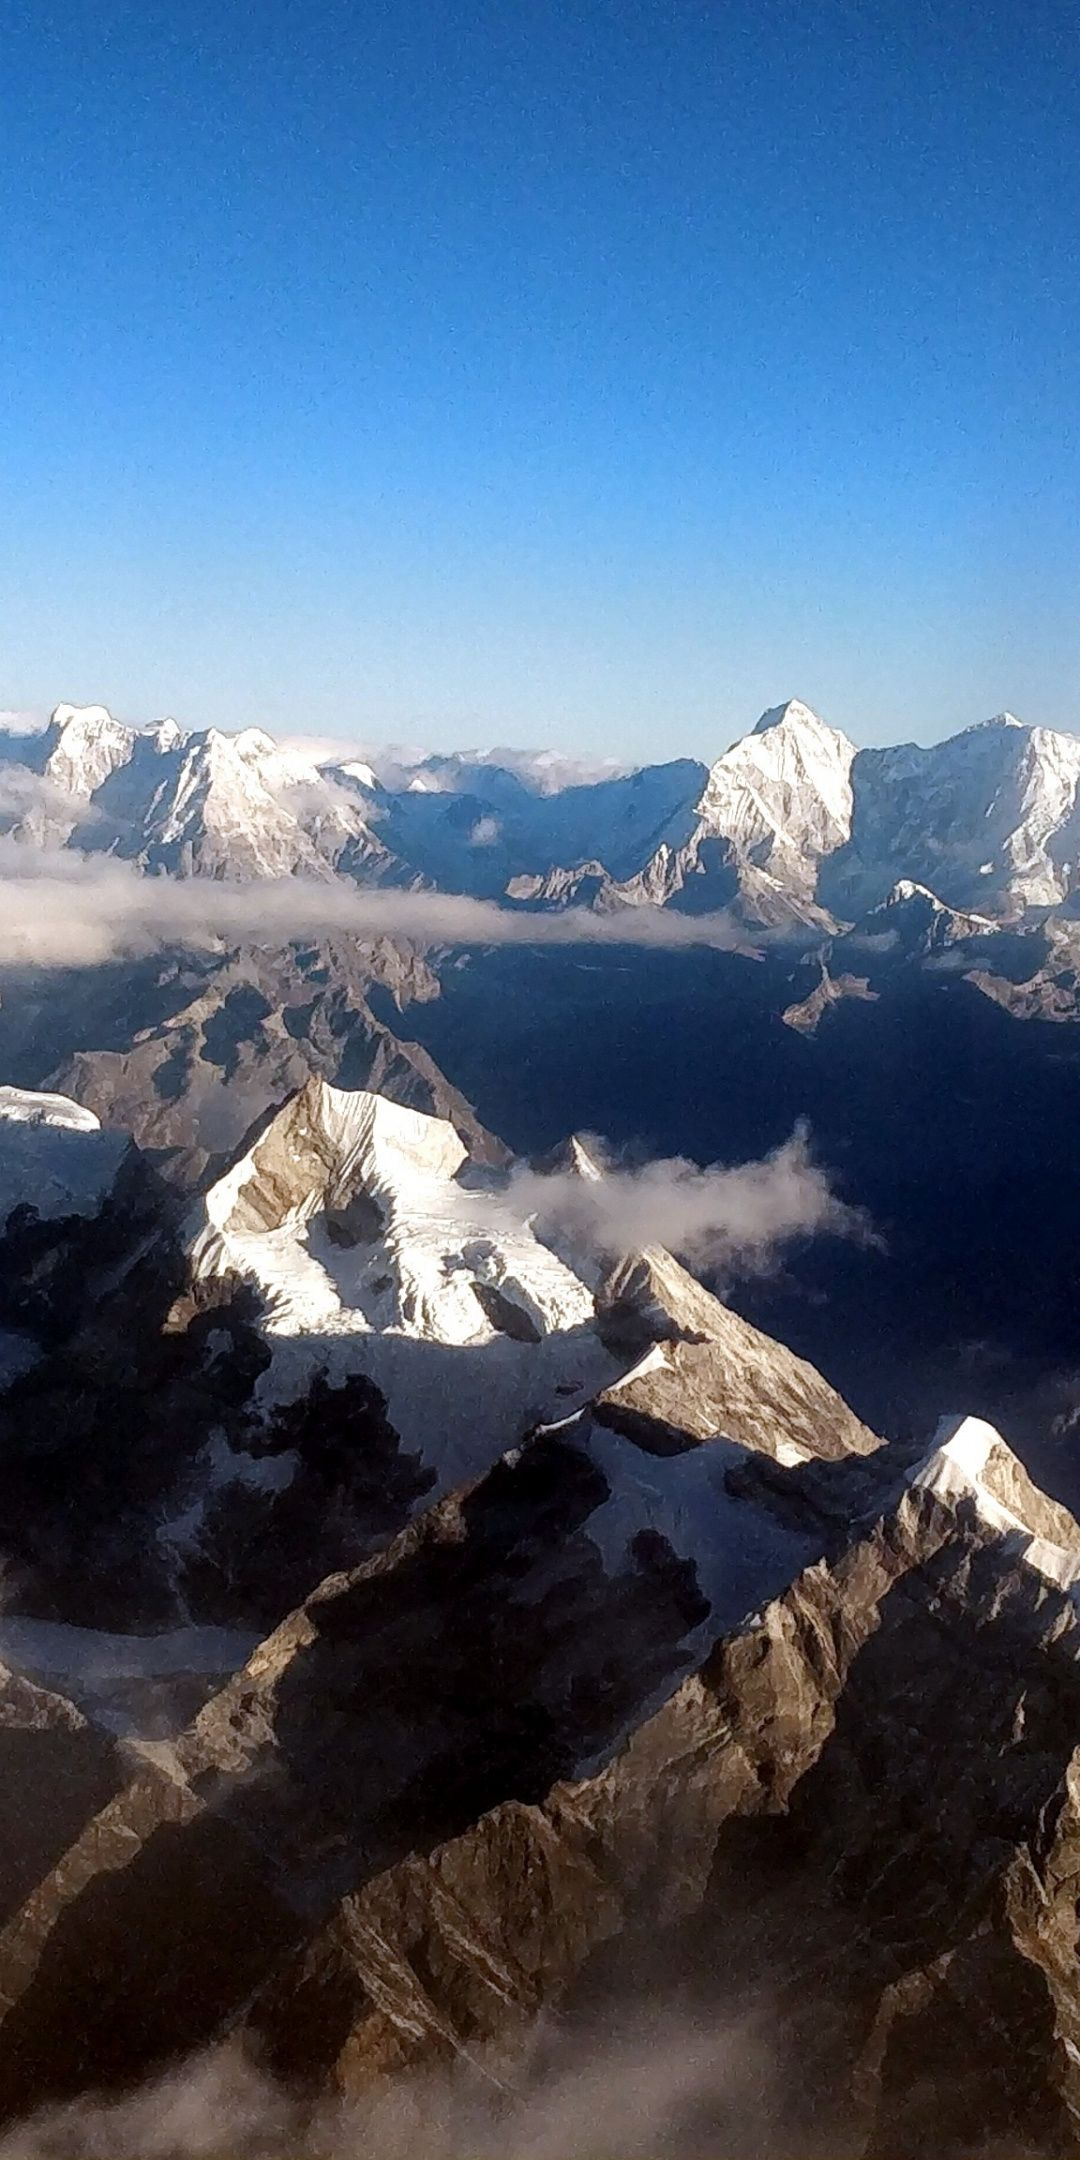 Himalayan Mountains Range Horizon Nepal 1080x2160 Wallpaper Beautiful Nature Wallpaper Nature Wallpaper Nature Pictures